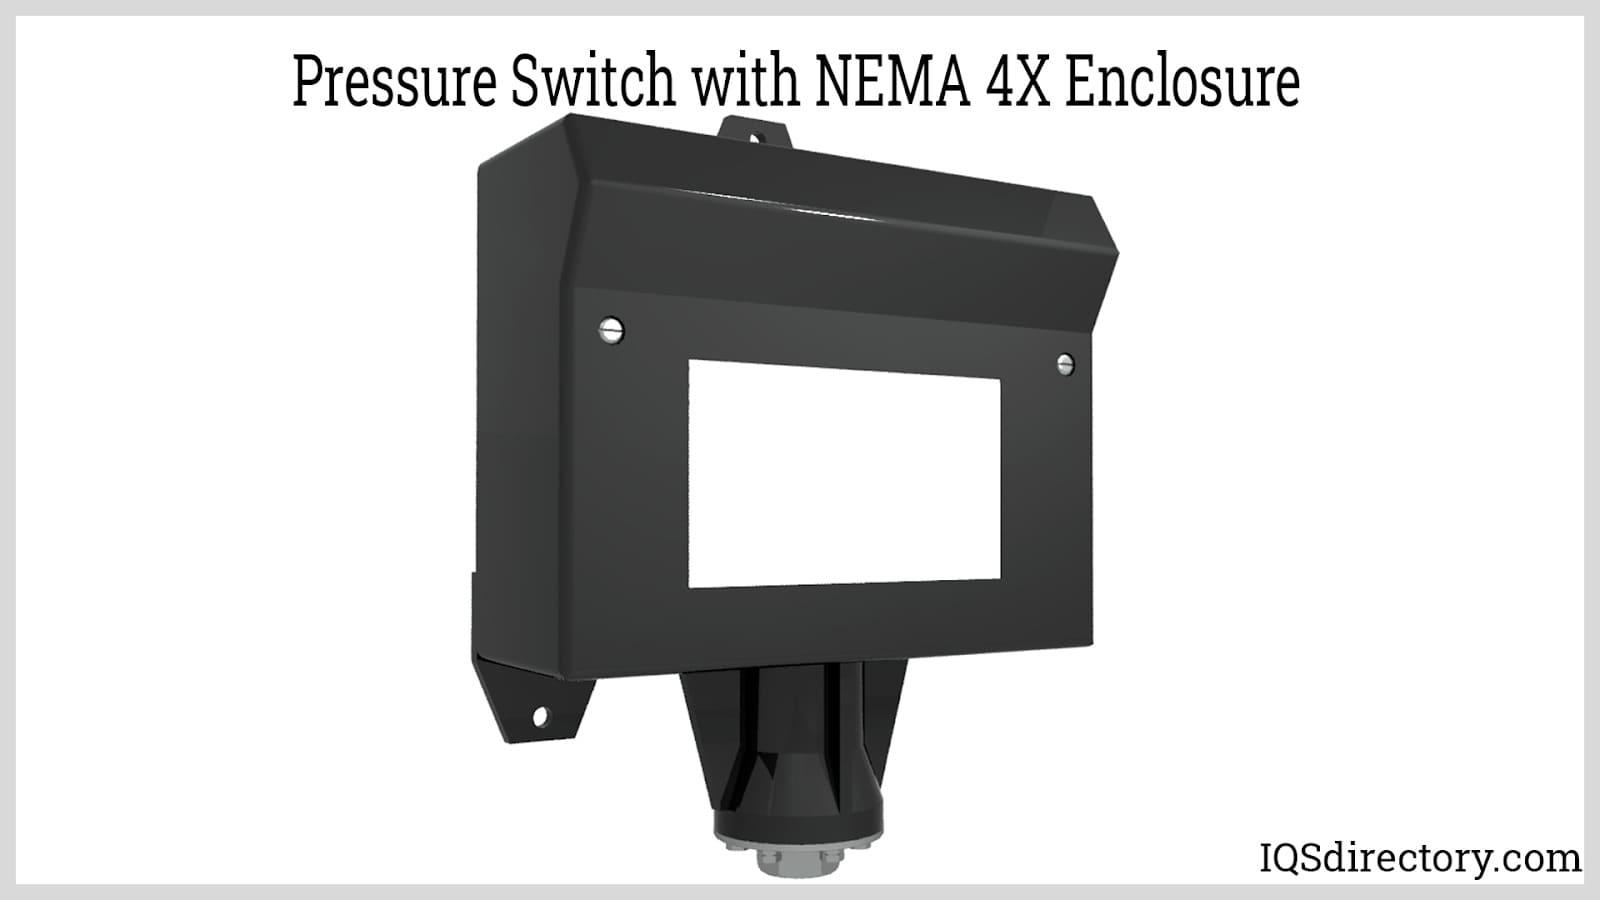 Pressure Switch with NEMA 4X Enclosure